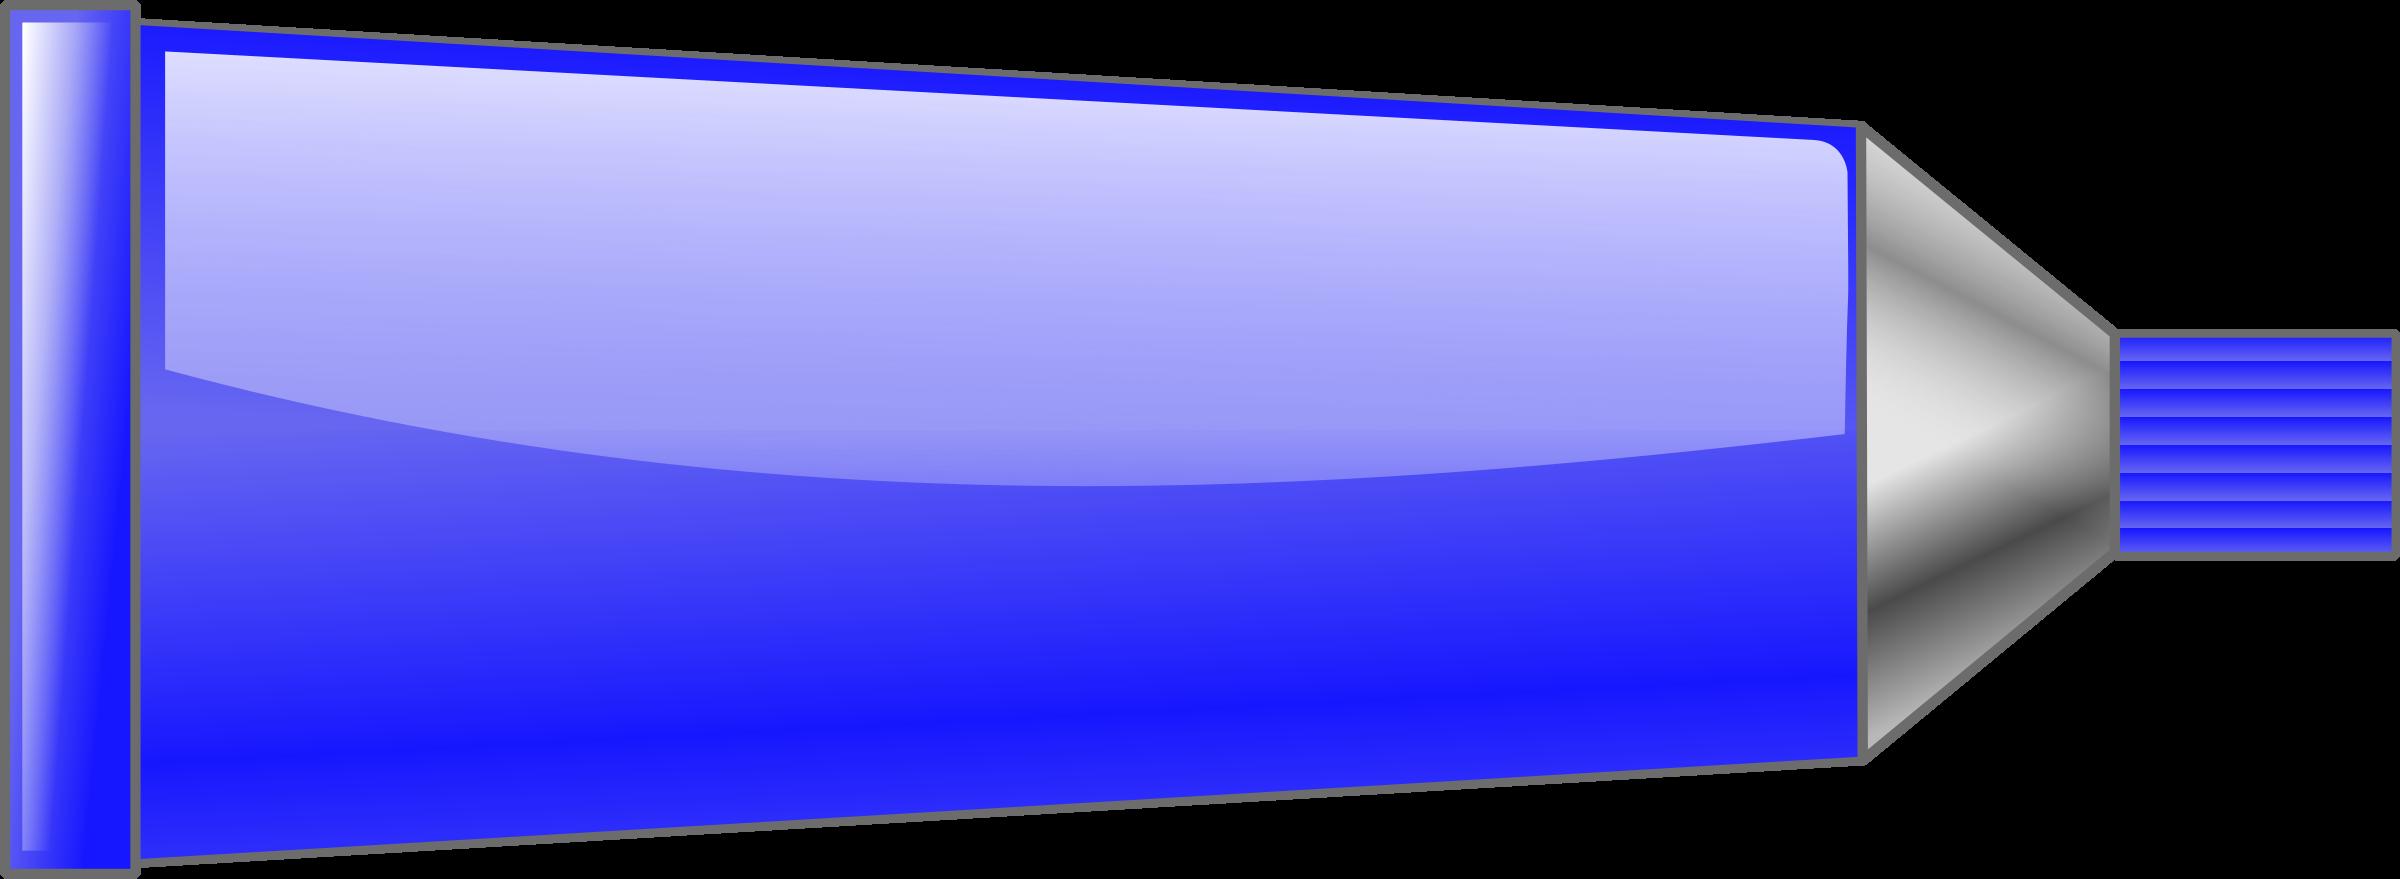 Tube big image png. Color clipart blue